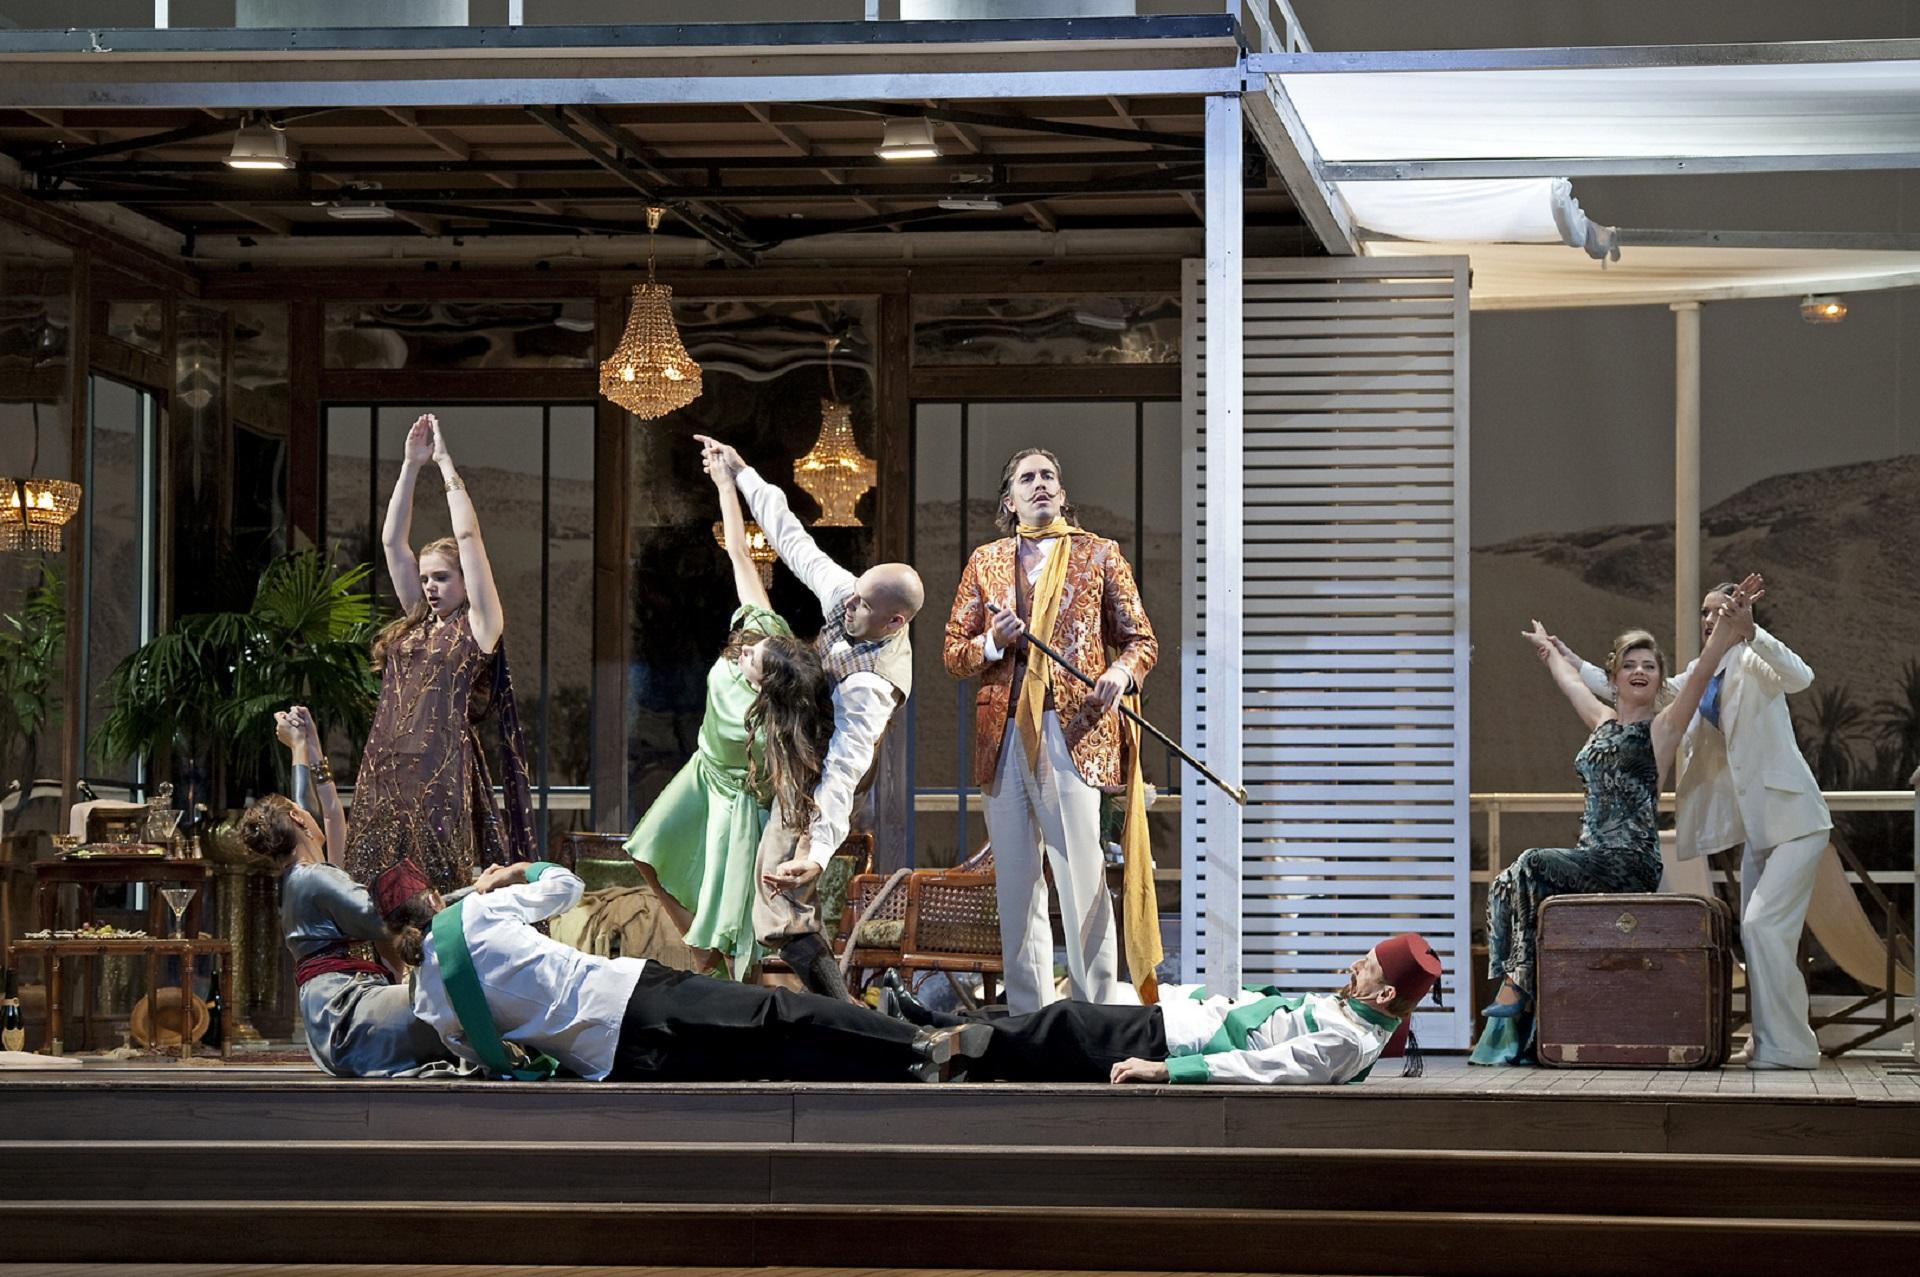 Pilger-Von-Mekka-Opera-Stage-Director-Jacopo-Spirei-10